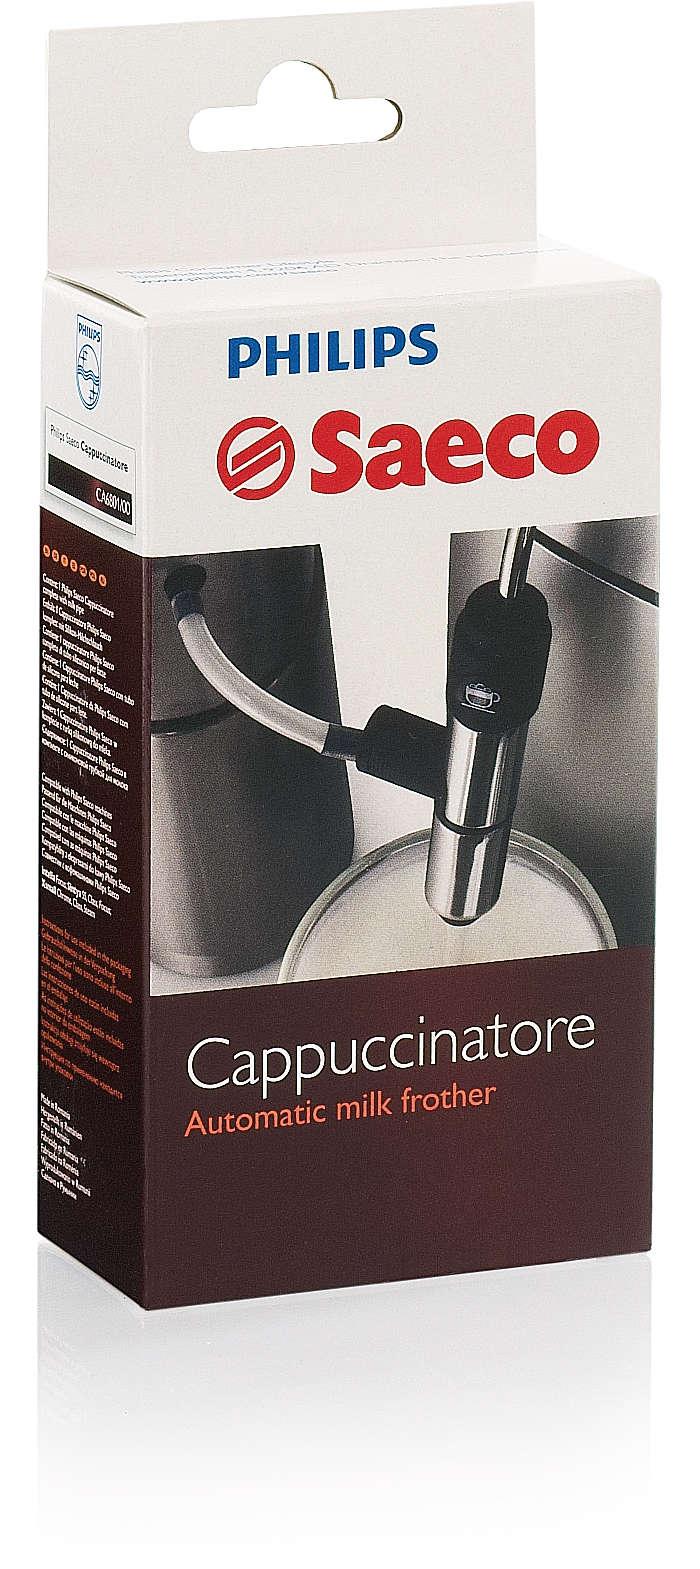 Algupärane Itaalia Cappuccino-masin teie Saecole